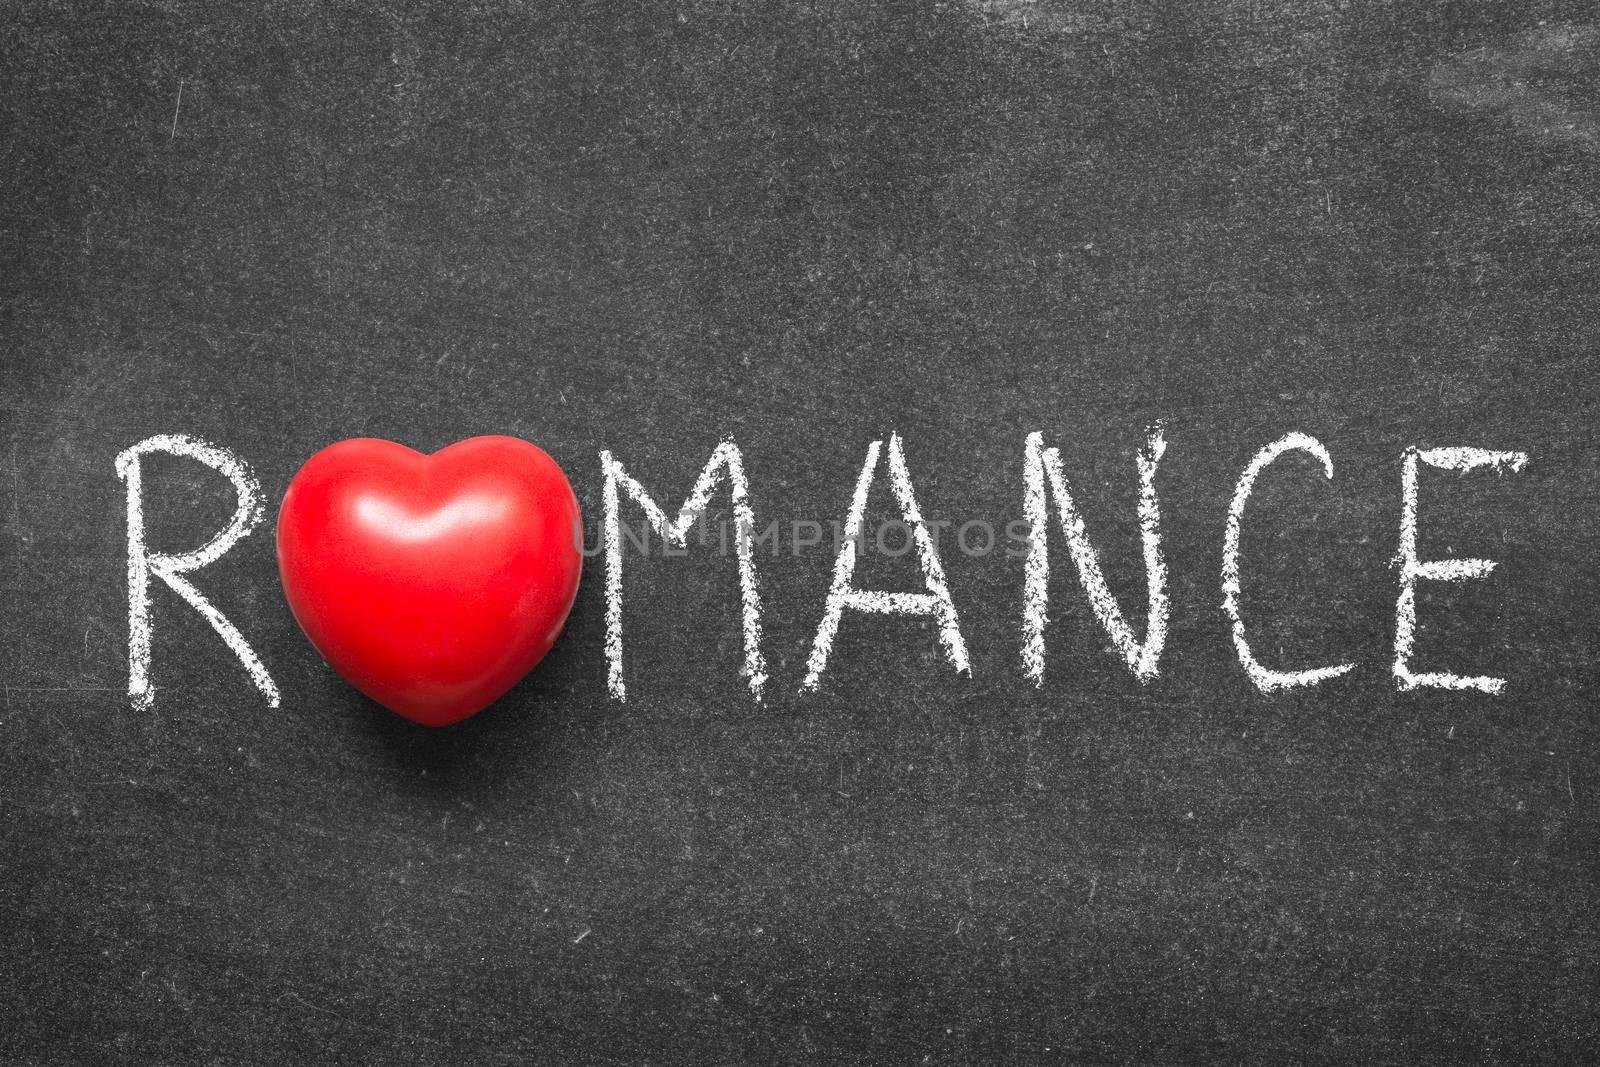 romance word handwritten on chalkboard with heart symbol instead of O